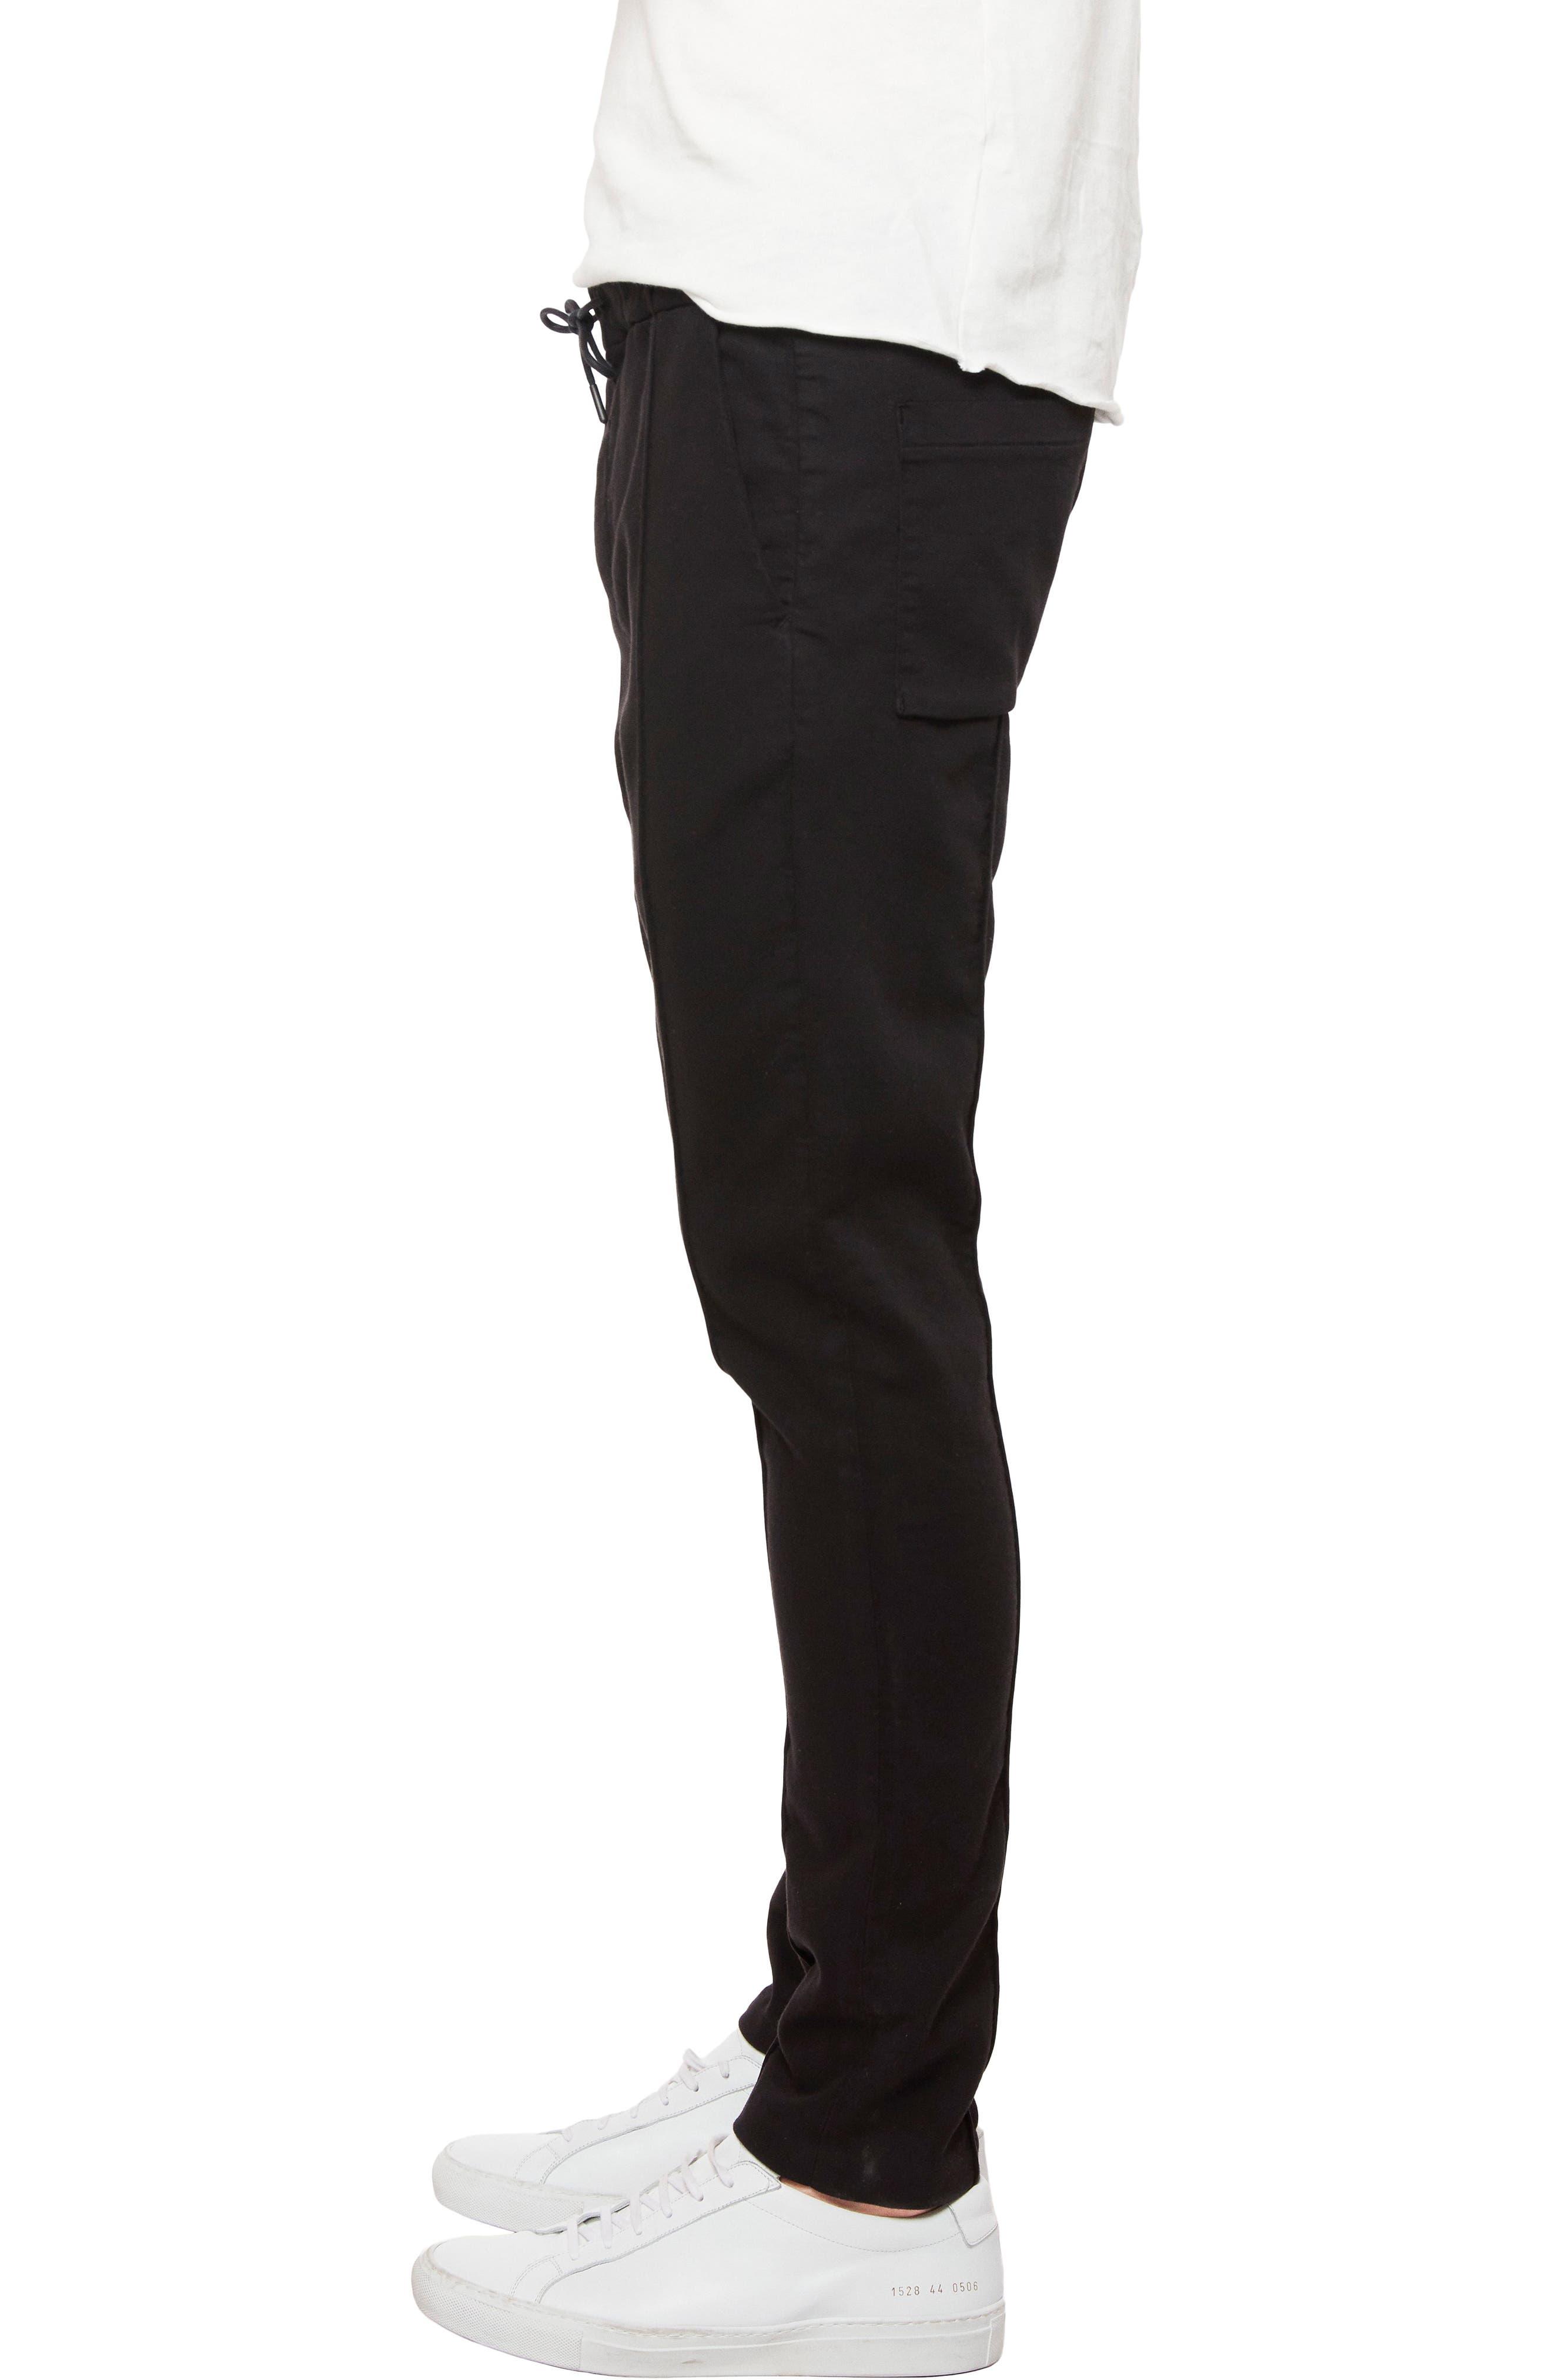 Wakat Relaxed Fit Jogger Pants,                             Alternate thumbnail 3, color,                             Black